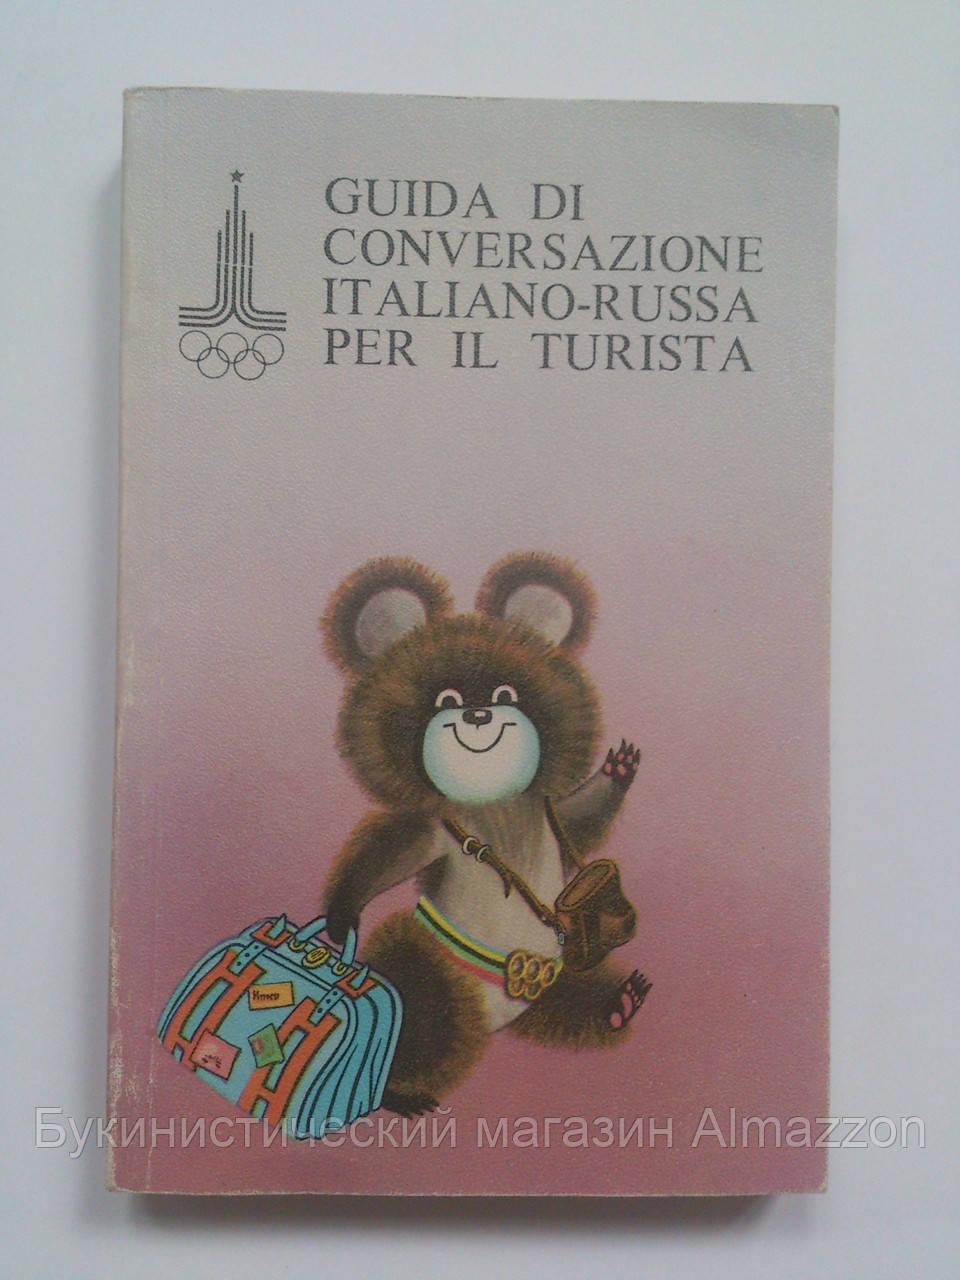 Итальянско-русский разговорник для туристов - Guida Di Conversazione Italiano-Russa Per Il Turista. Олимпиада